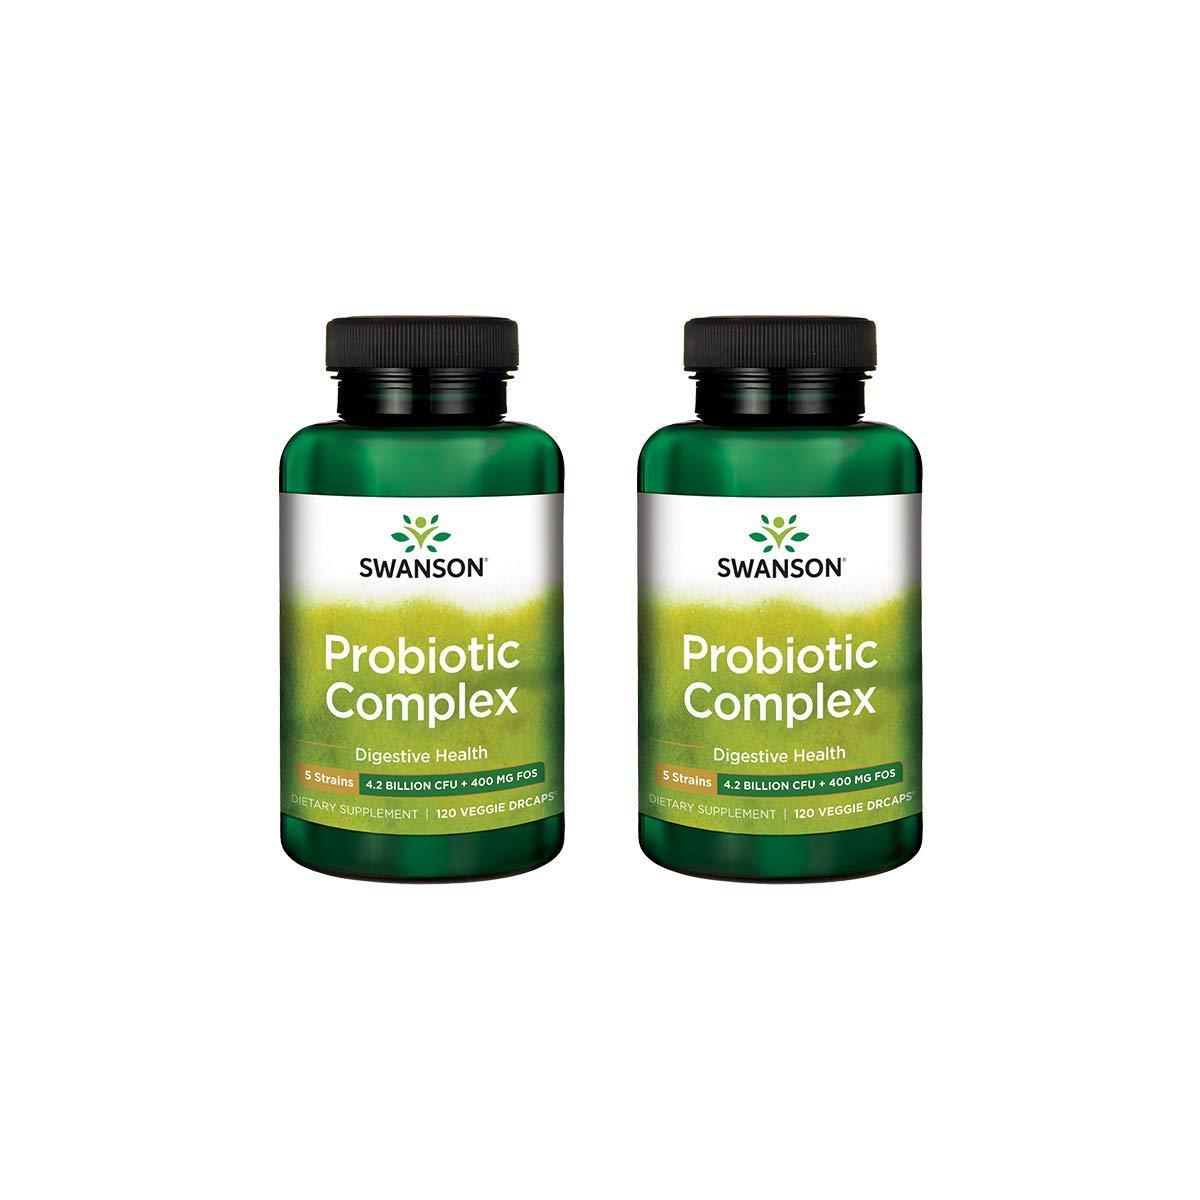 Swanson Probiotic Digestive Metabolism Supplement